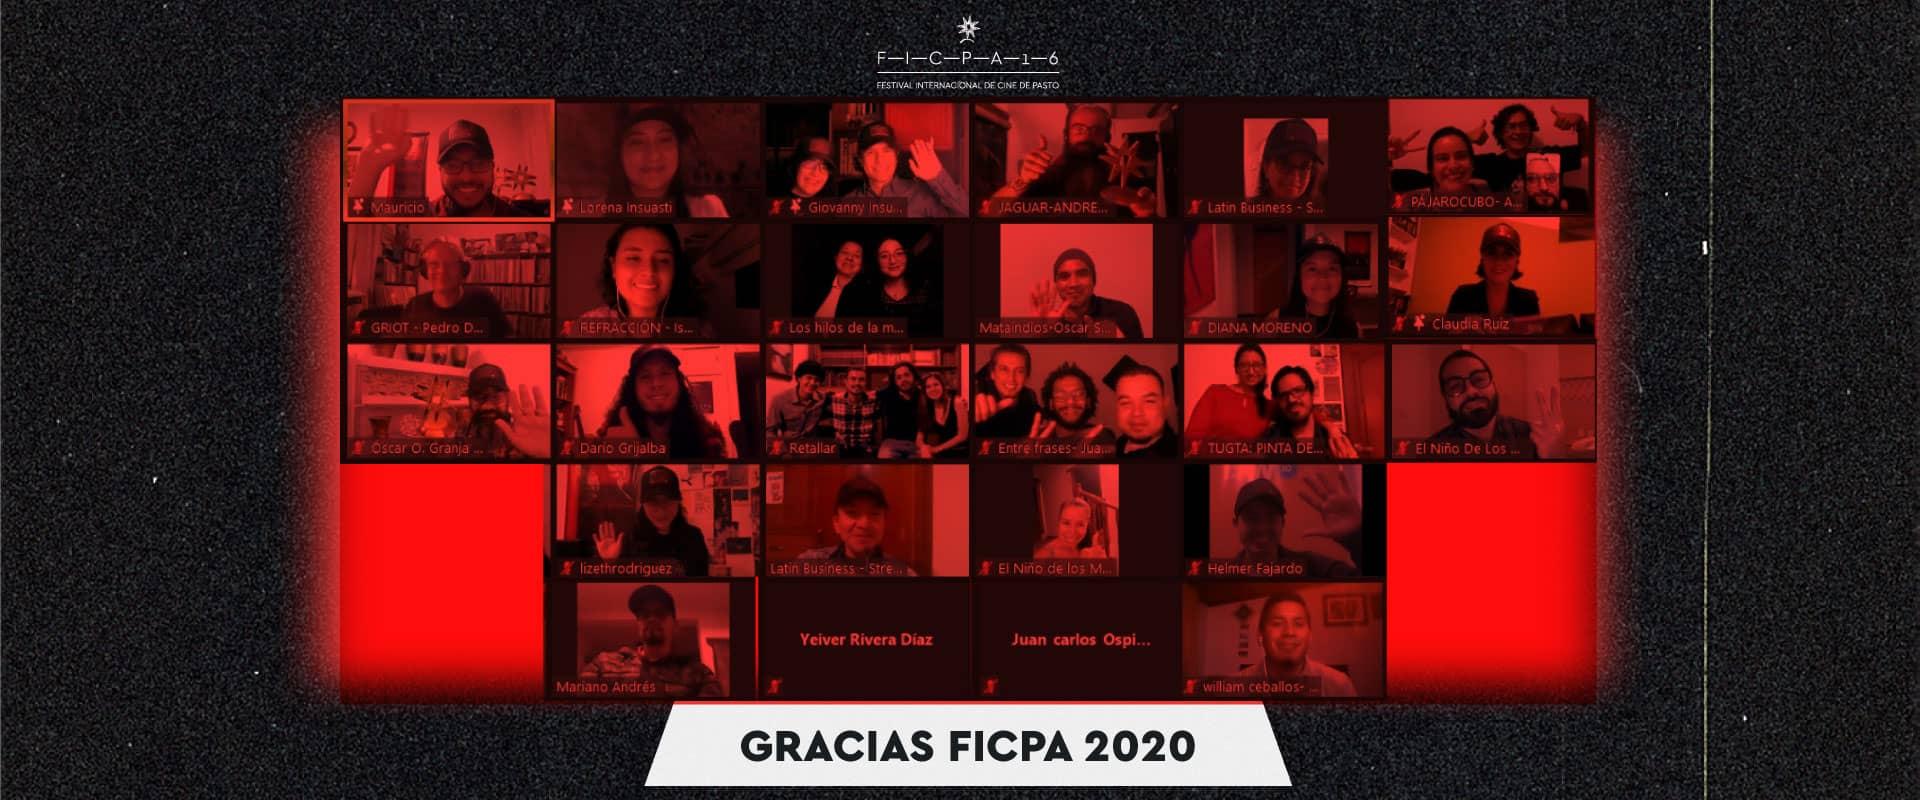 Gracias FICPA 2020